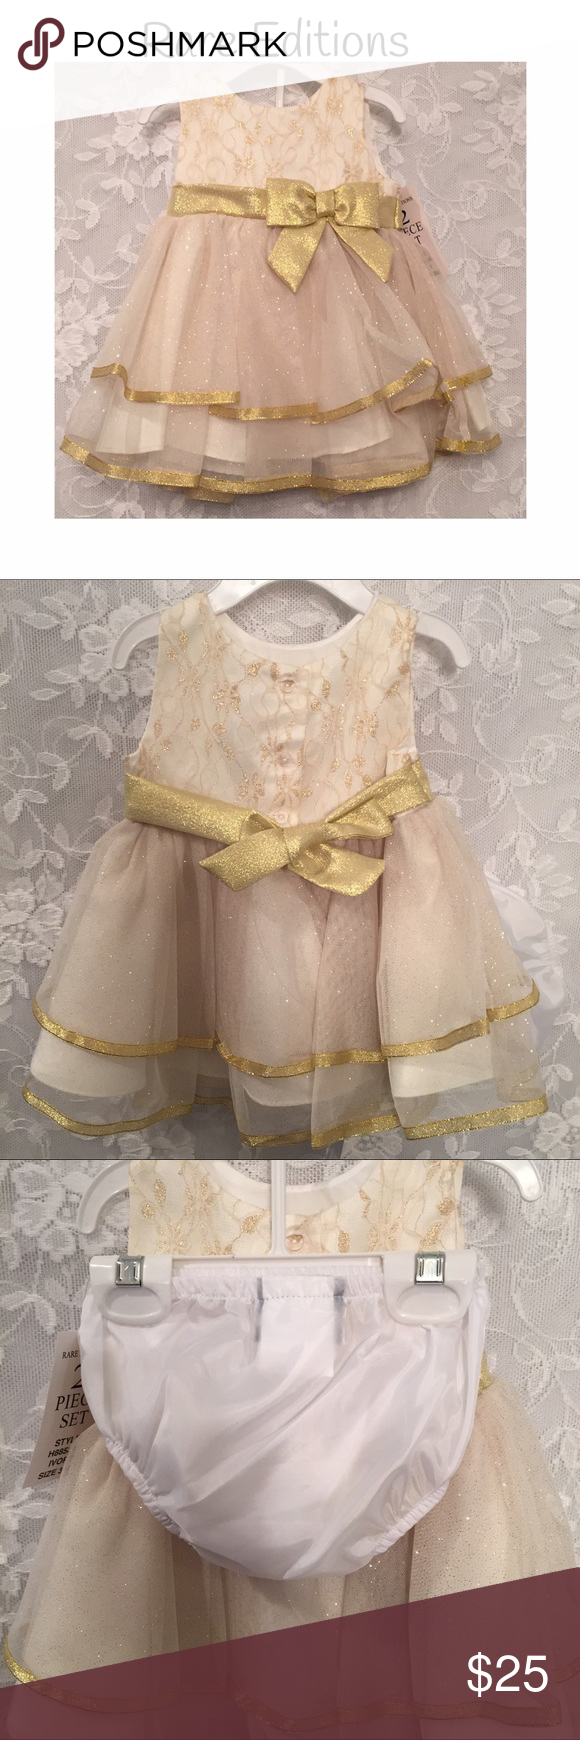 rare editions dresscreamy glittery gold color nwt formal